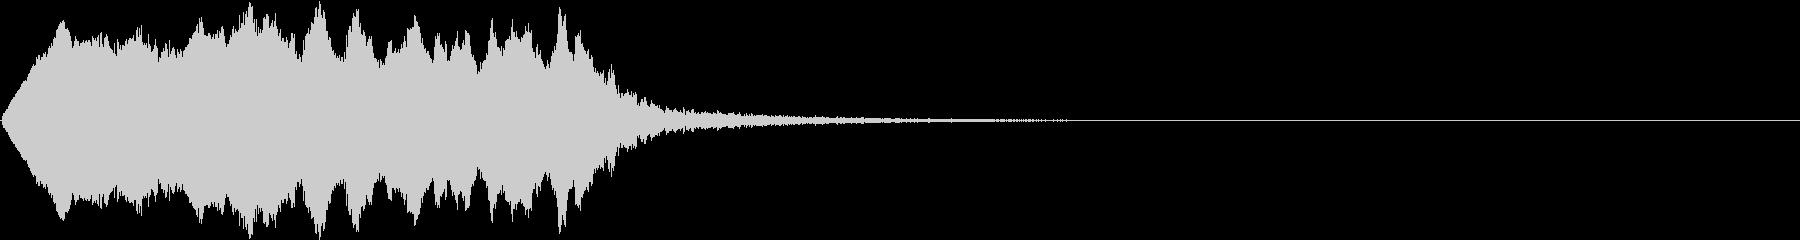 SE ポワーン クイズ出題前 上昇音の未再生の波形